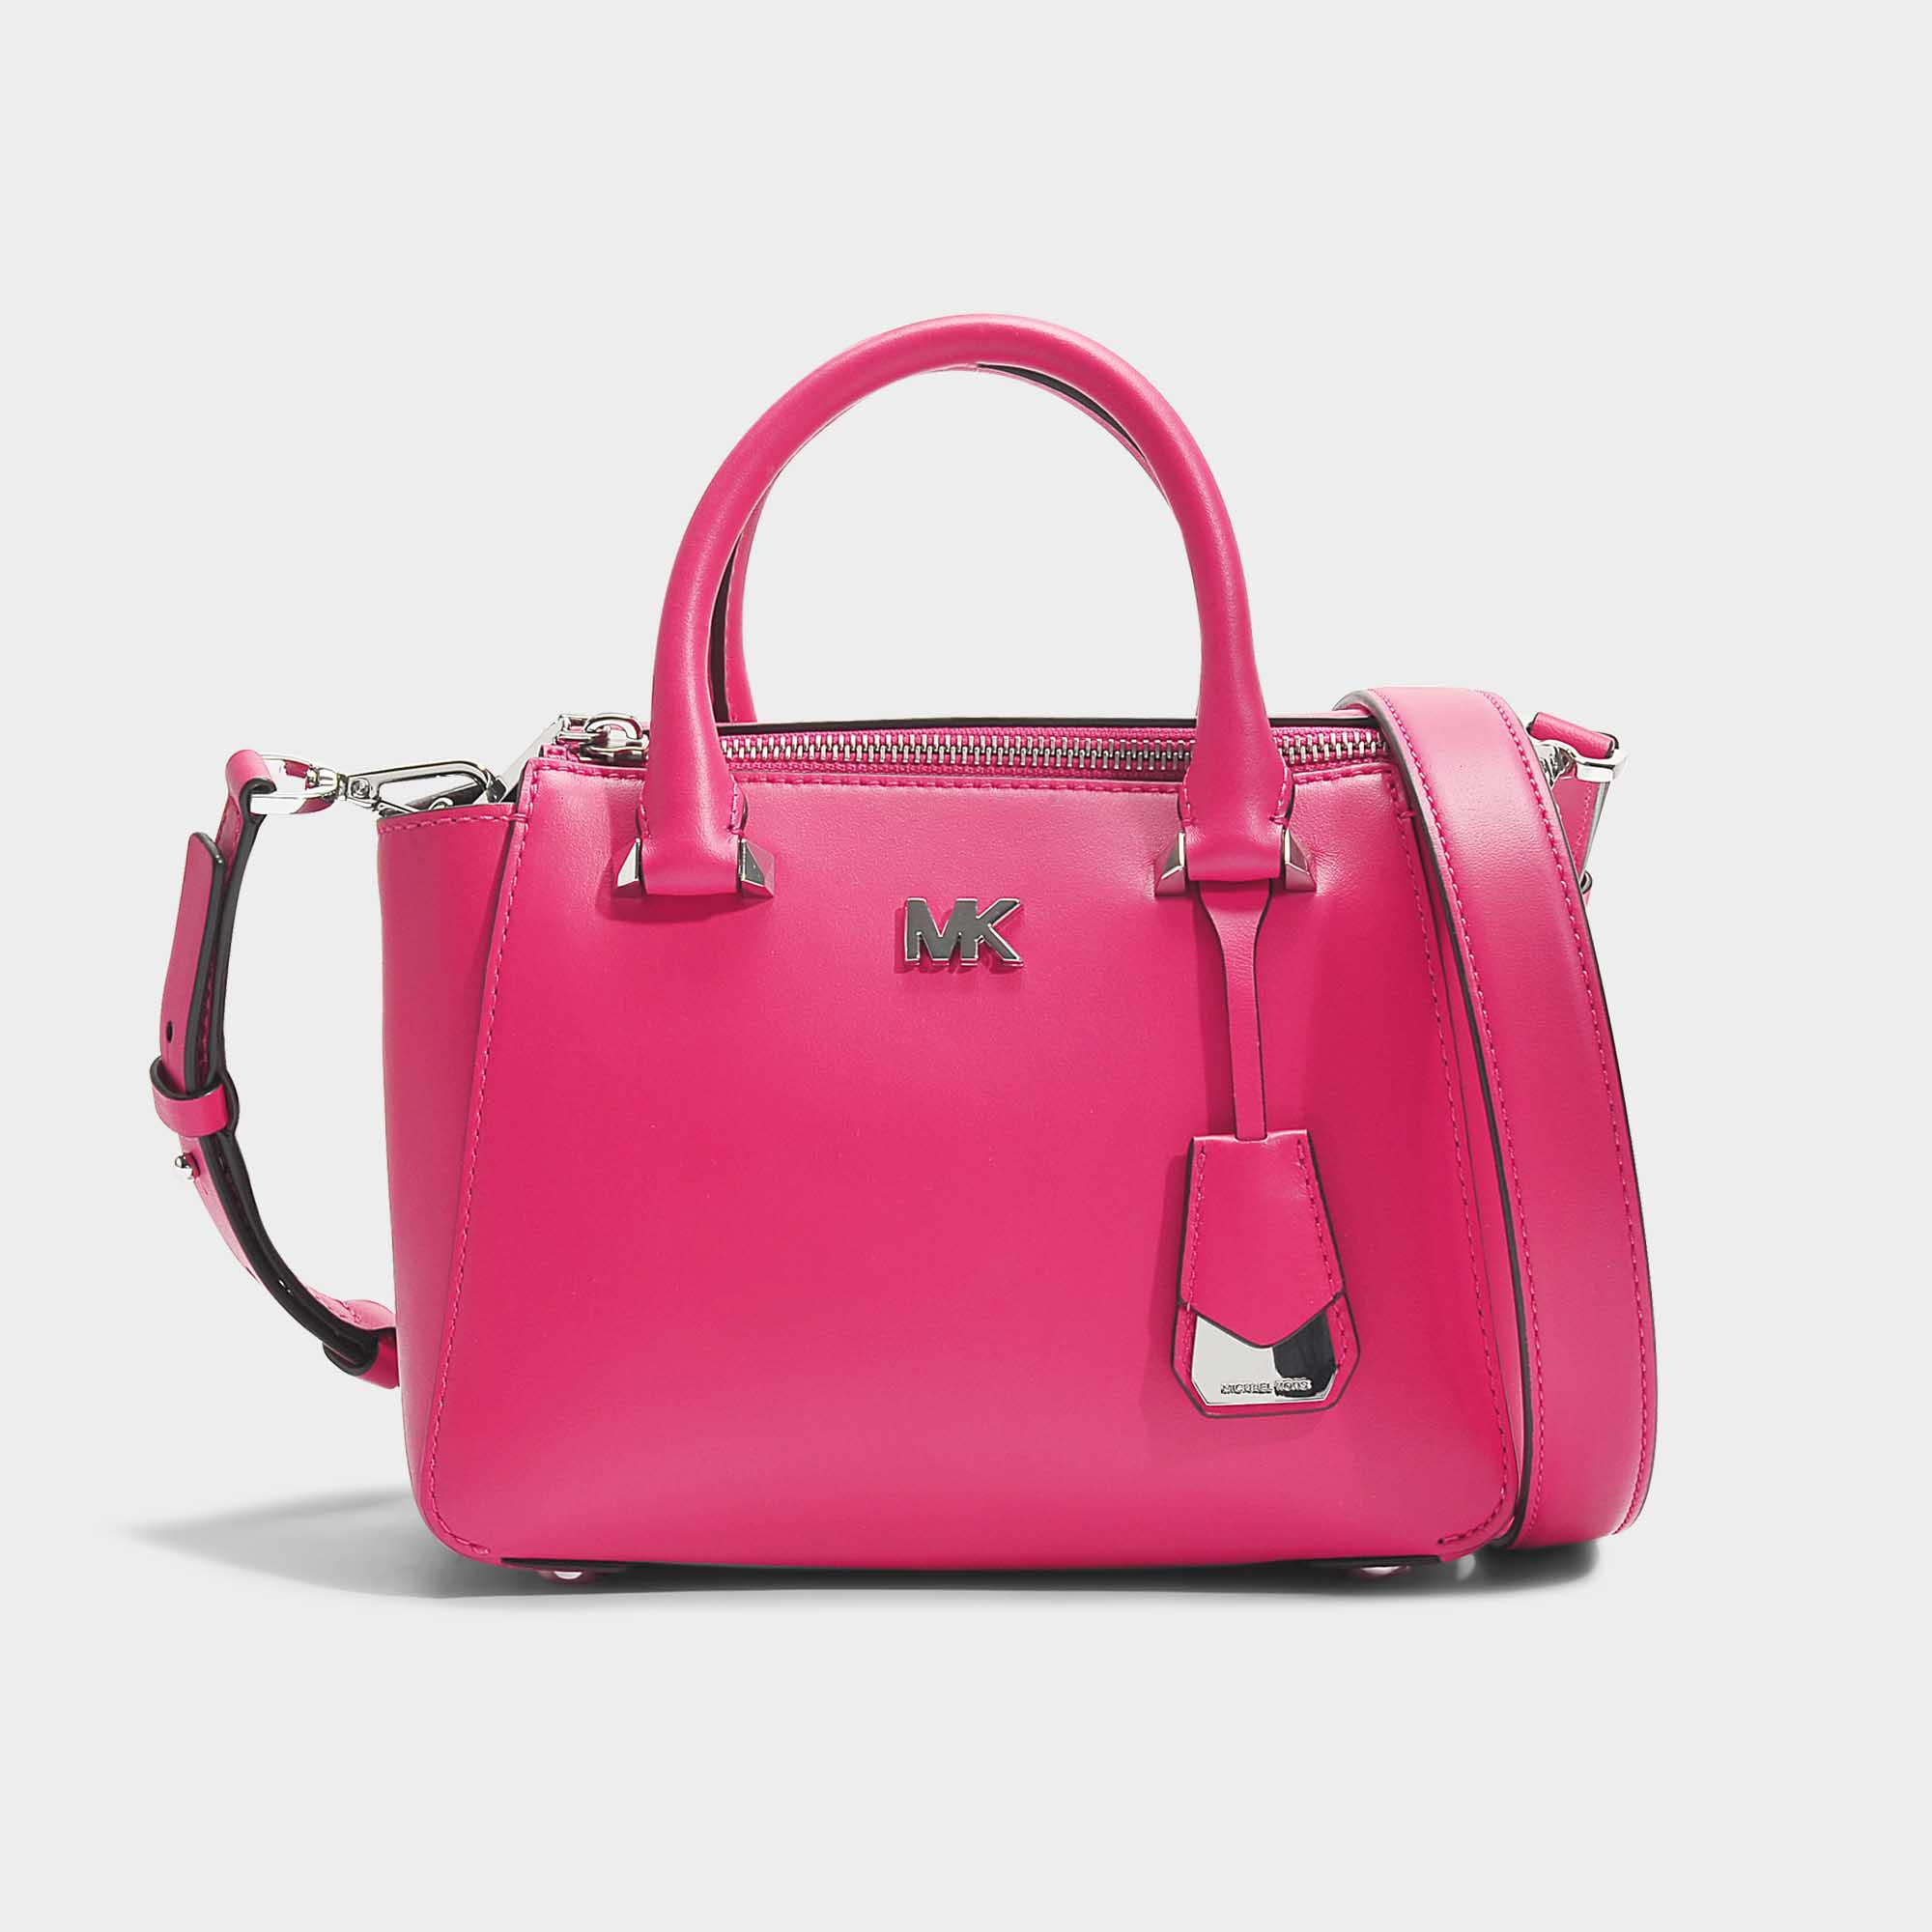 Mercer Medium Messenger Bag in Ultra Pink Python Embossed Calfskin Michael Michael Kors 5sHDvWA6PX